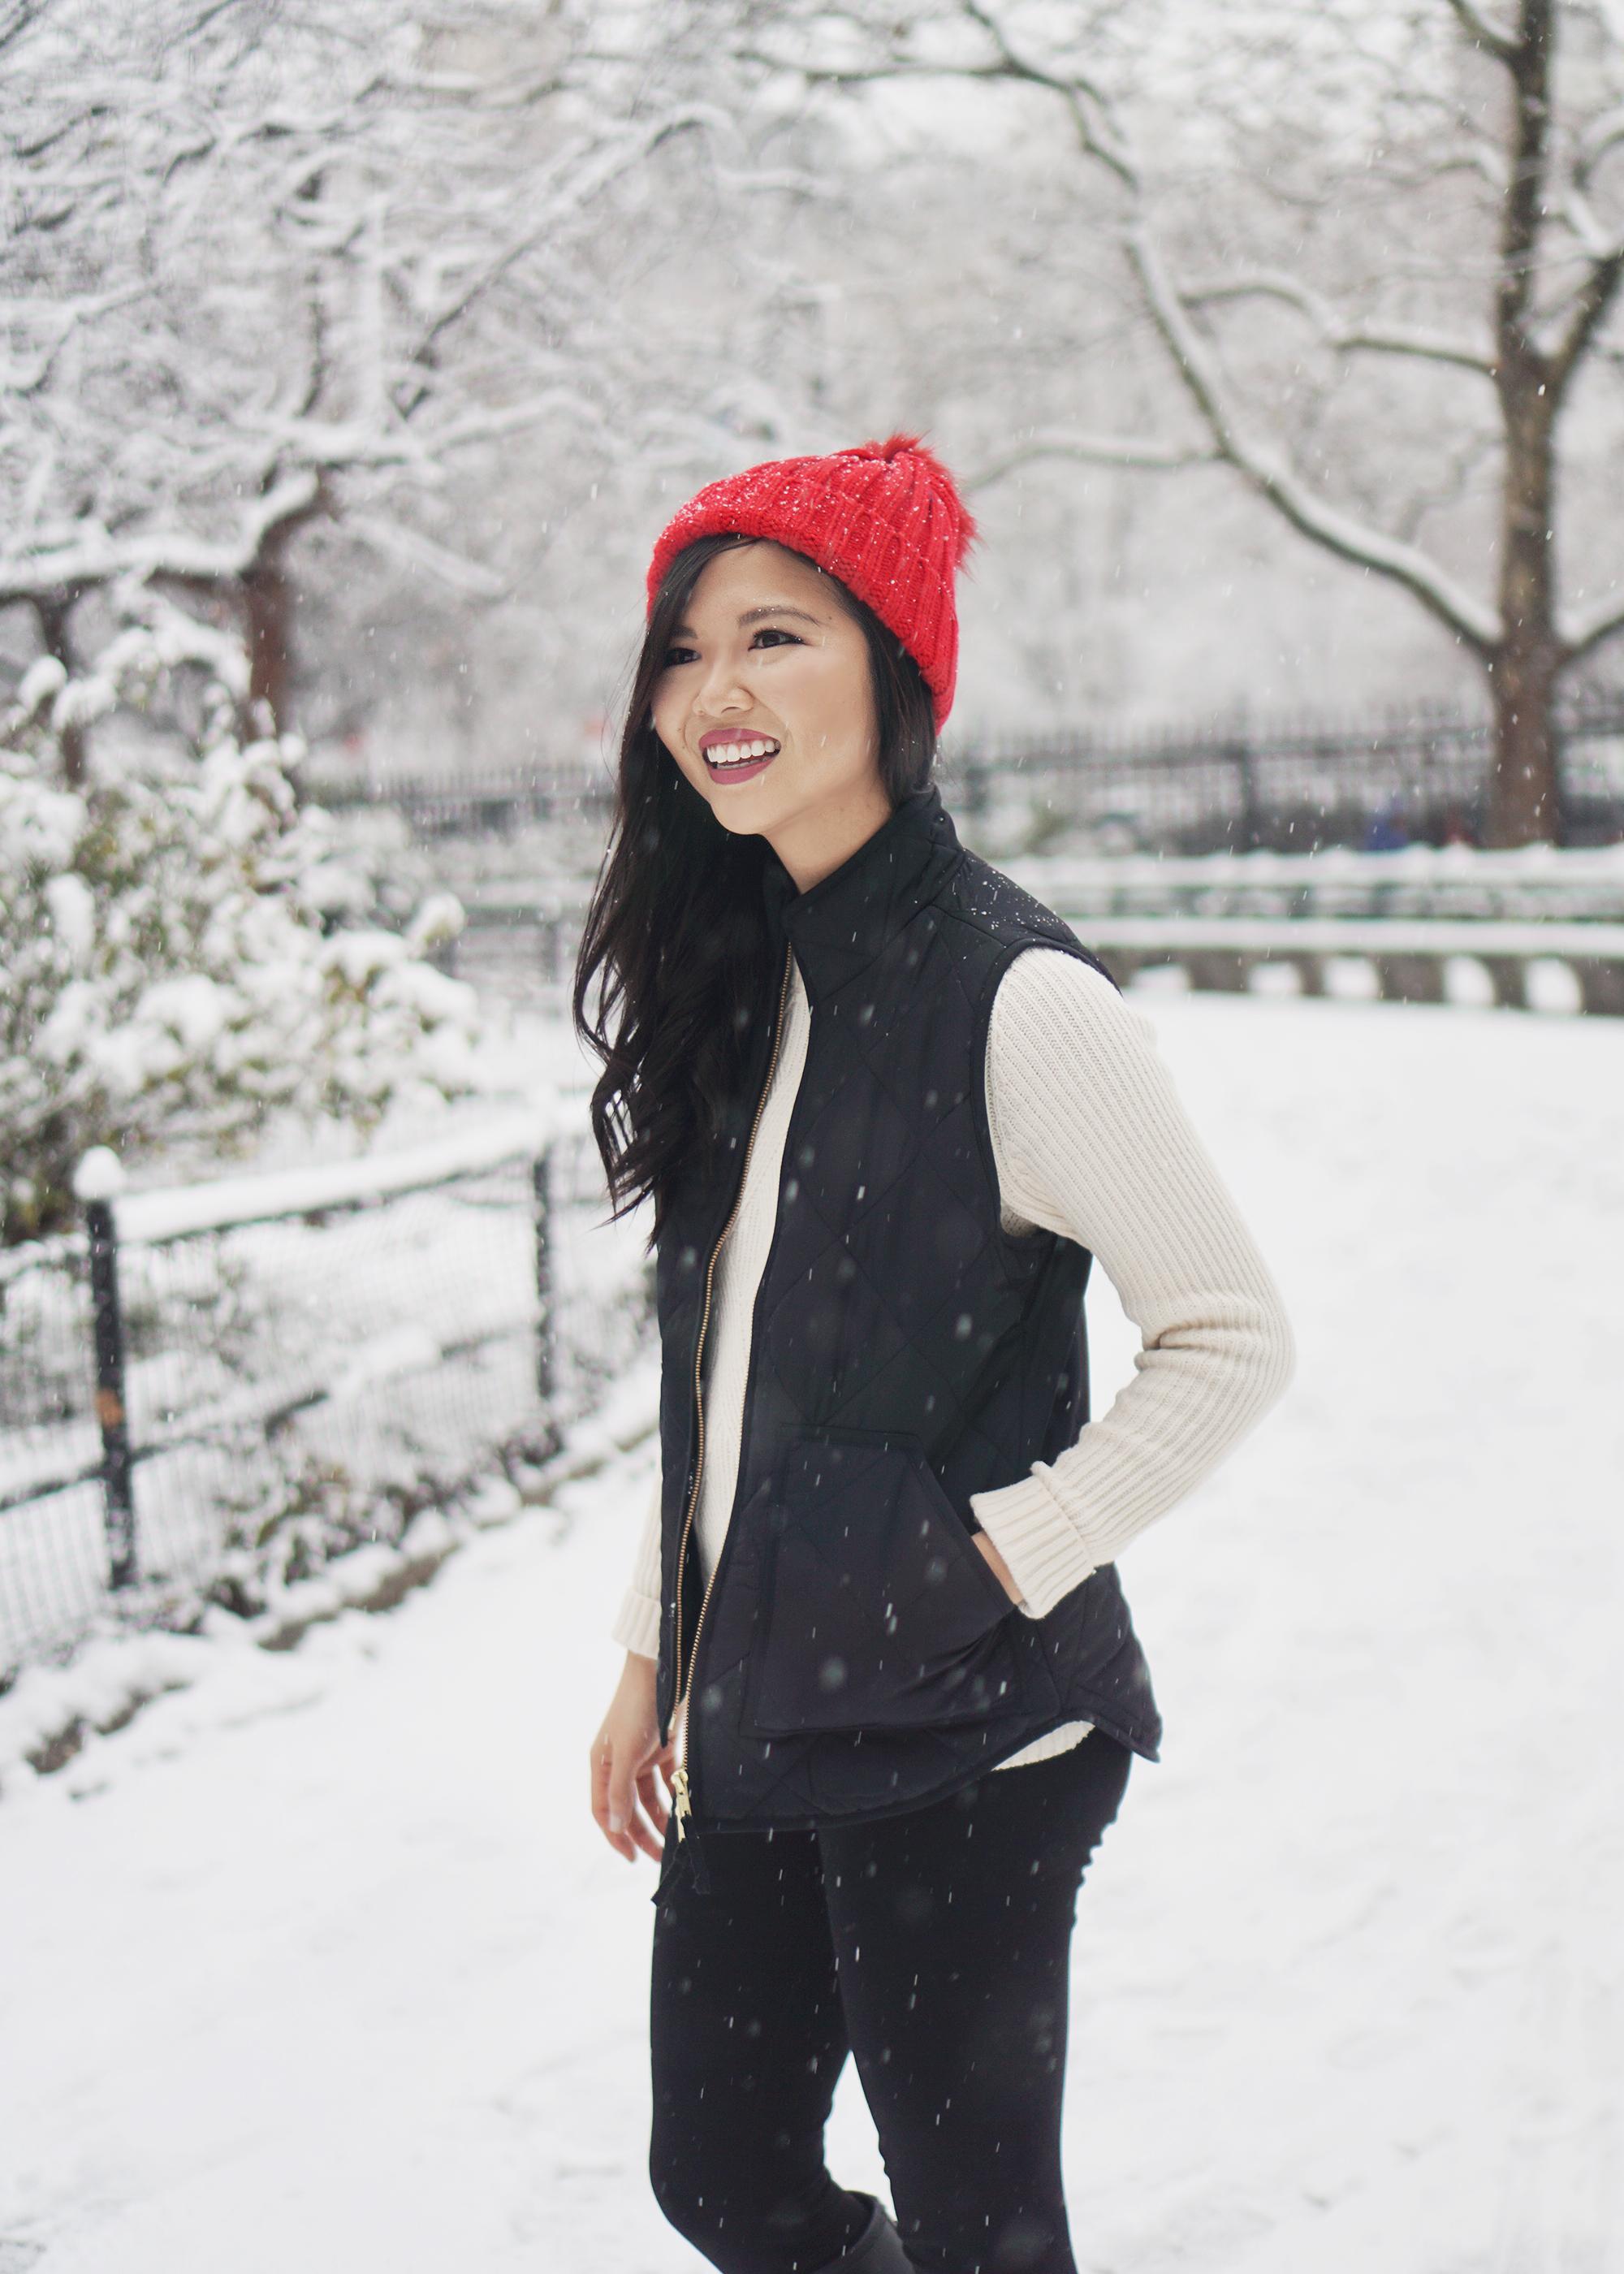 Winter Fashion Inspiration: Puffer Vest & Pom Pom Beanie